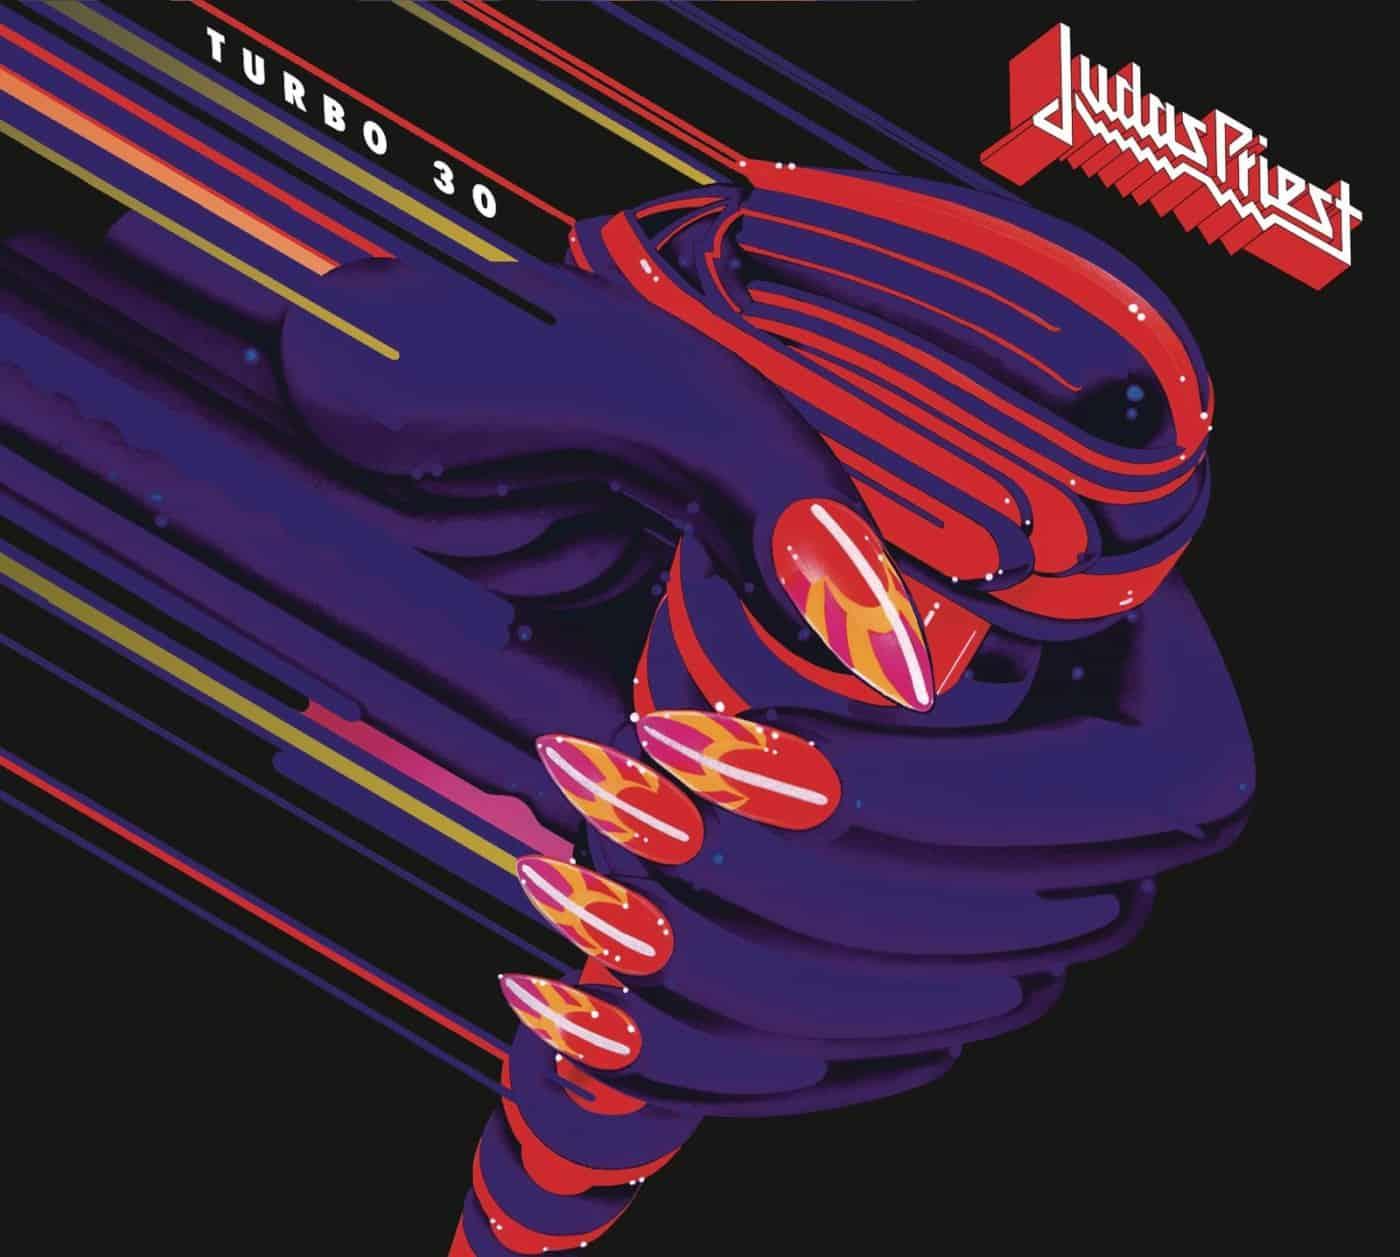 Album Artwork – Judas Priest-1